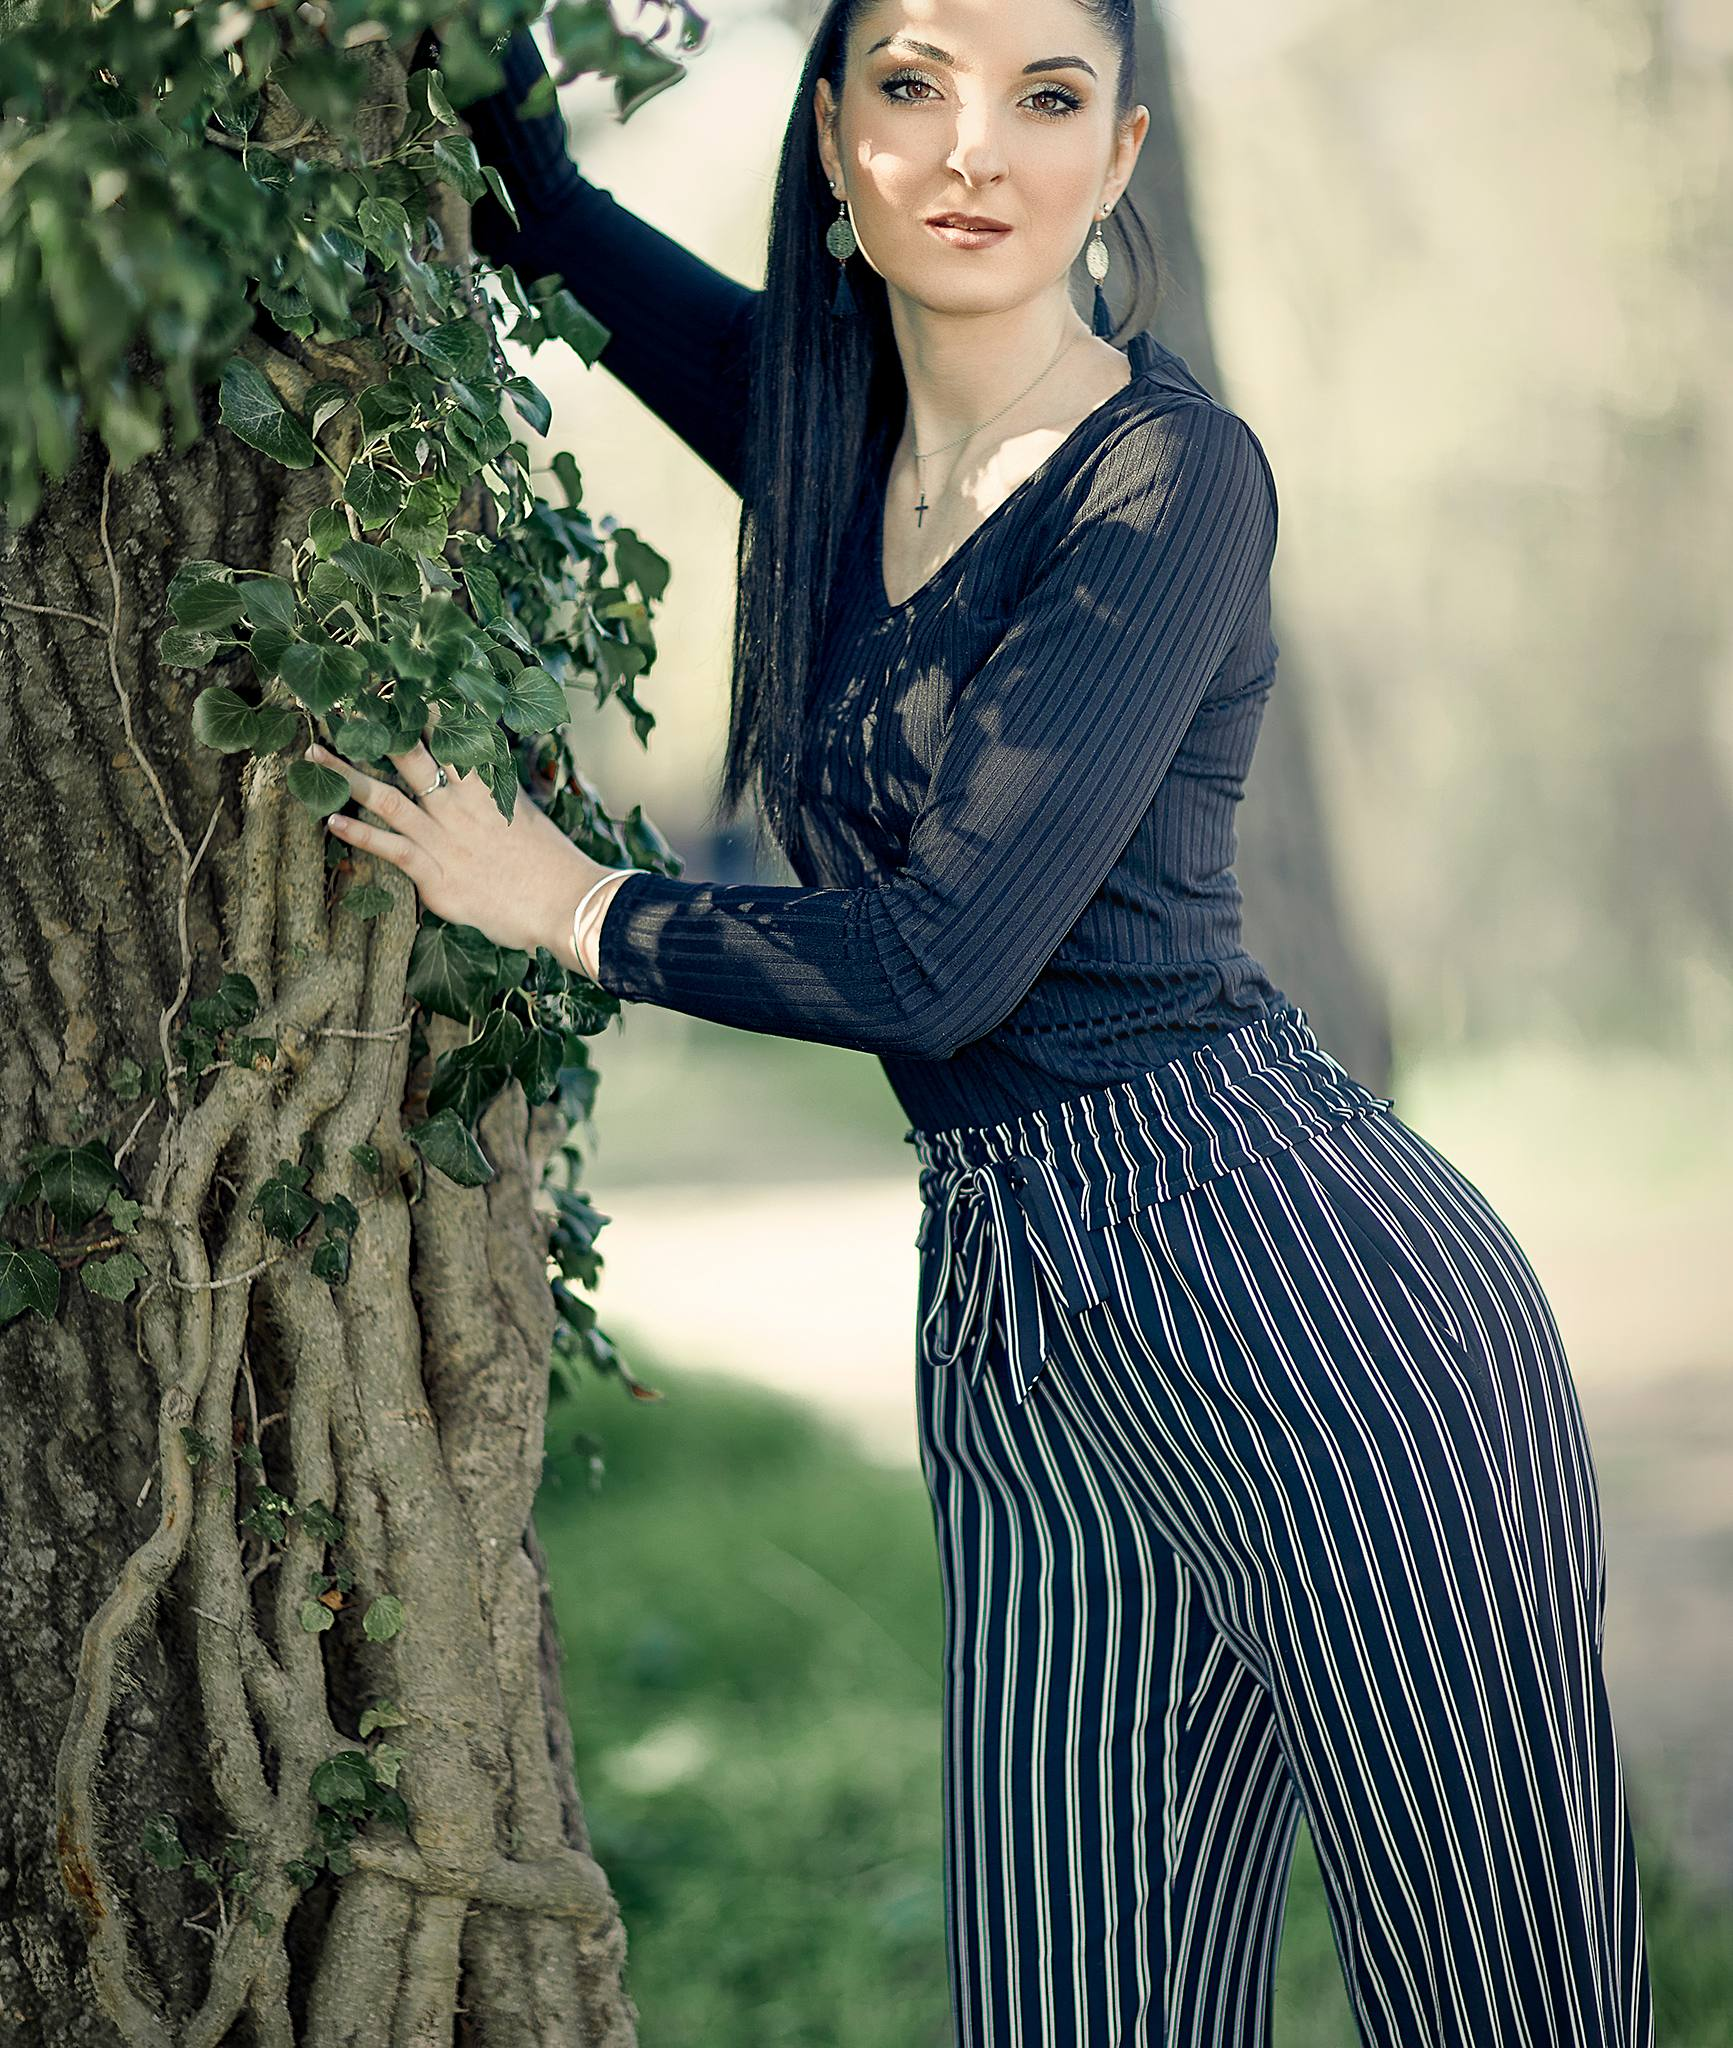 femme debout nature